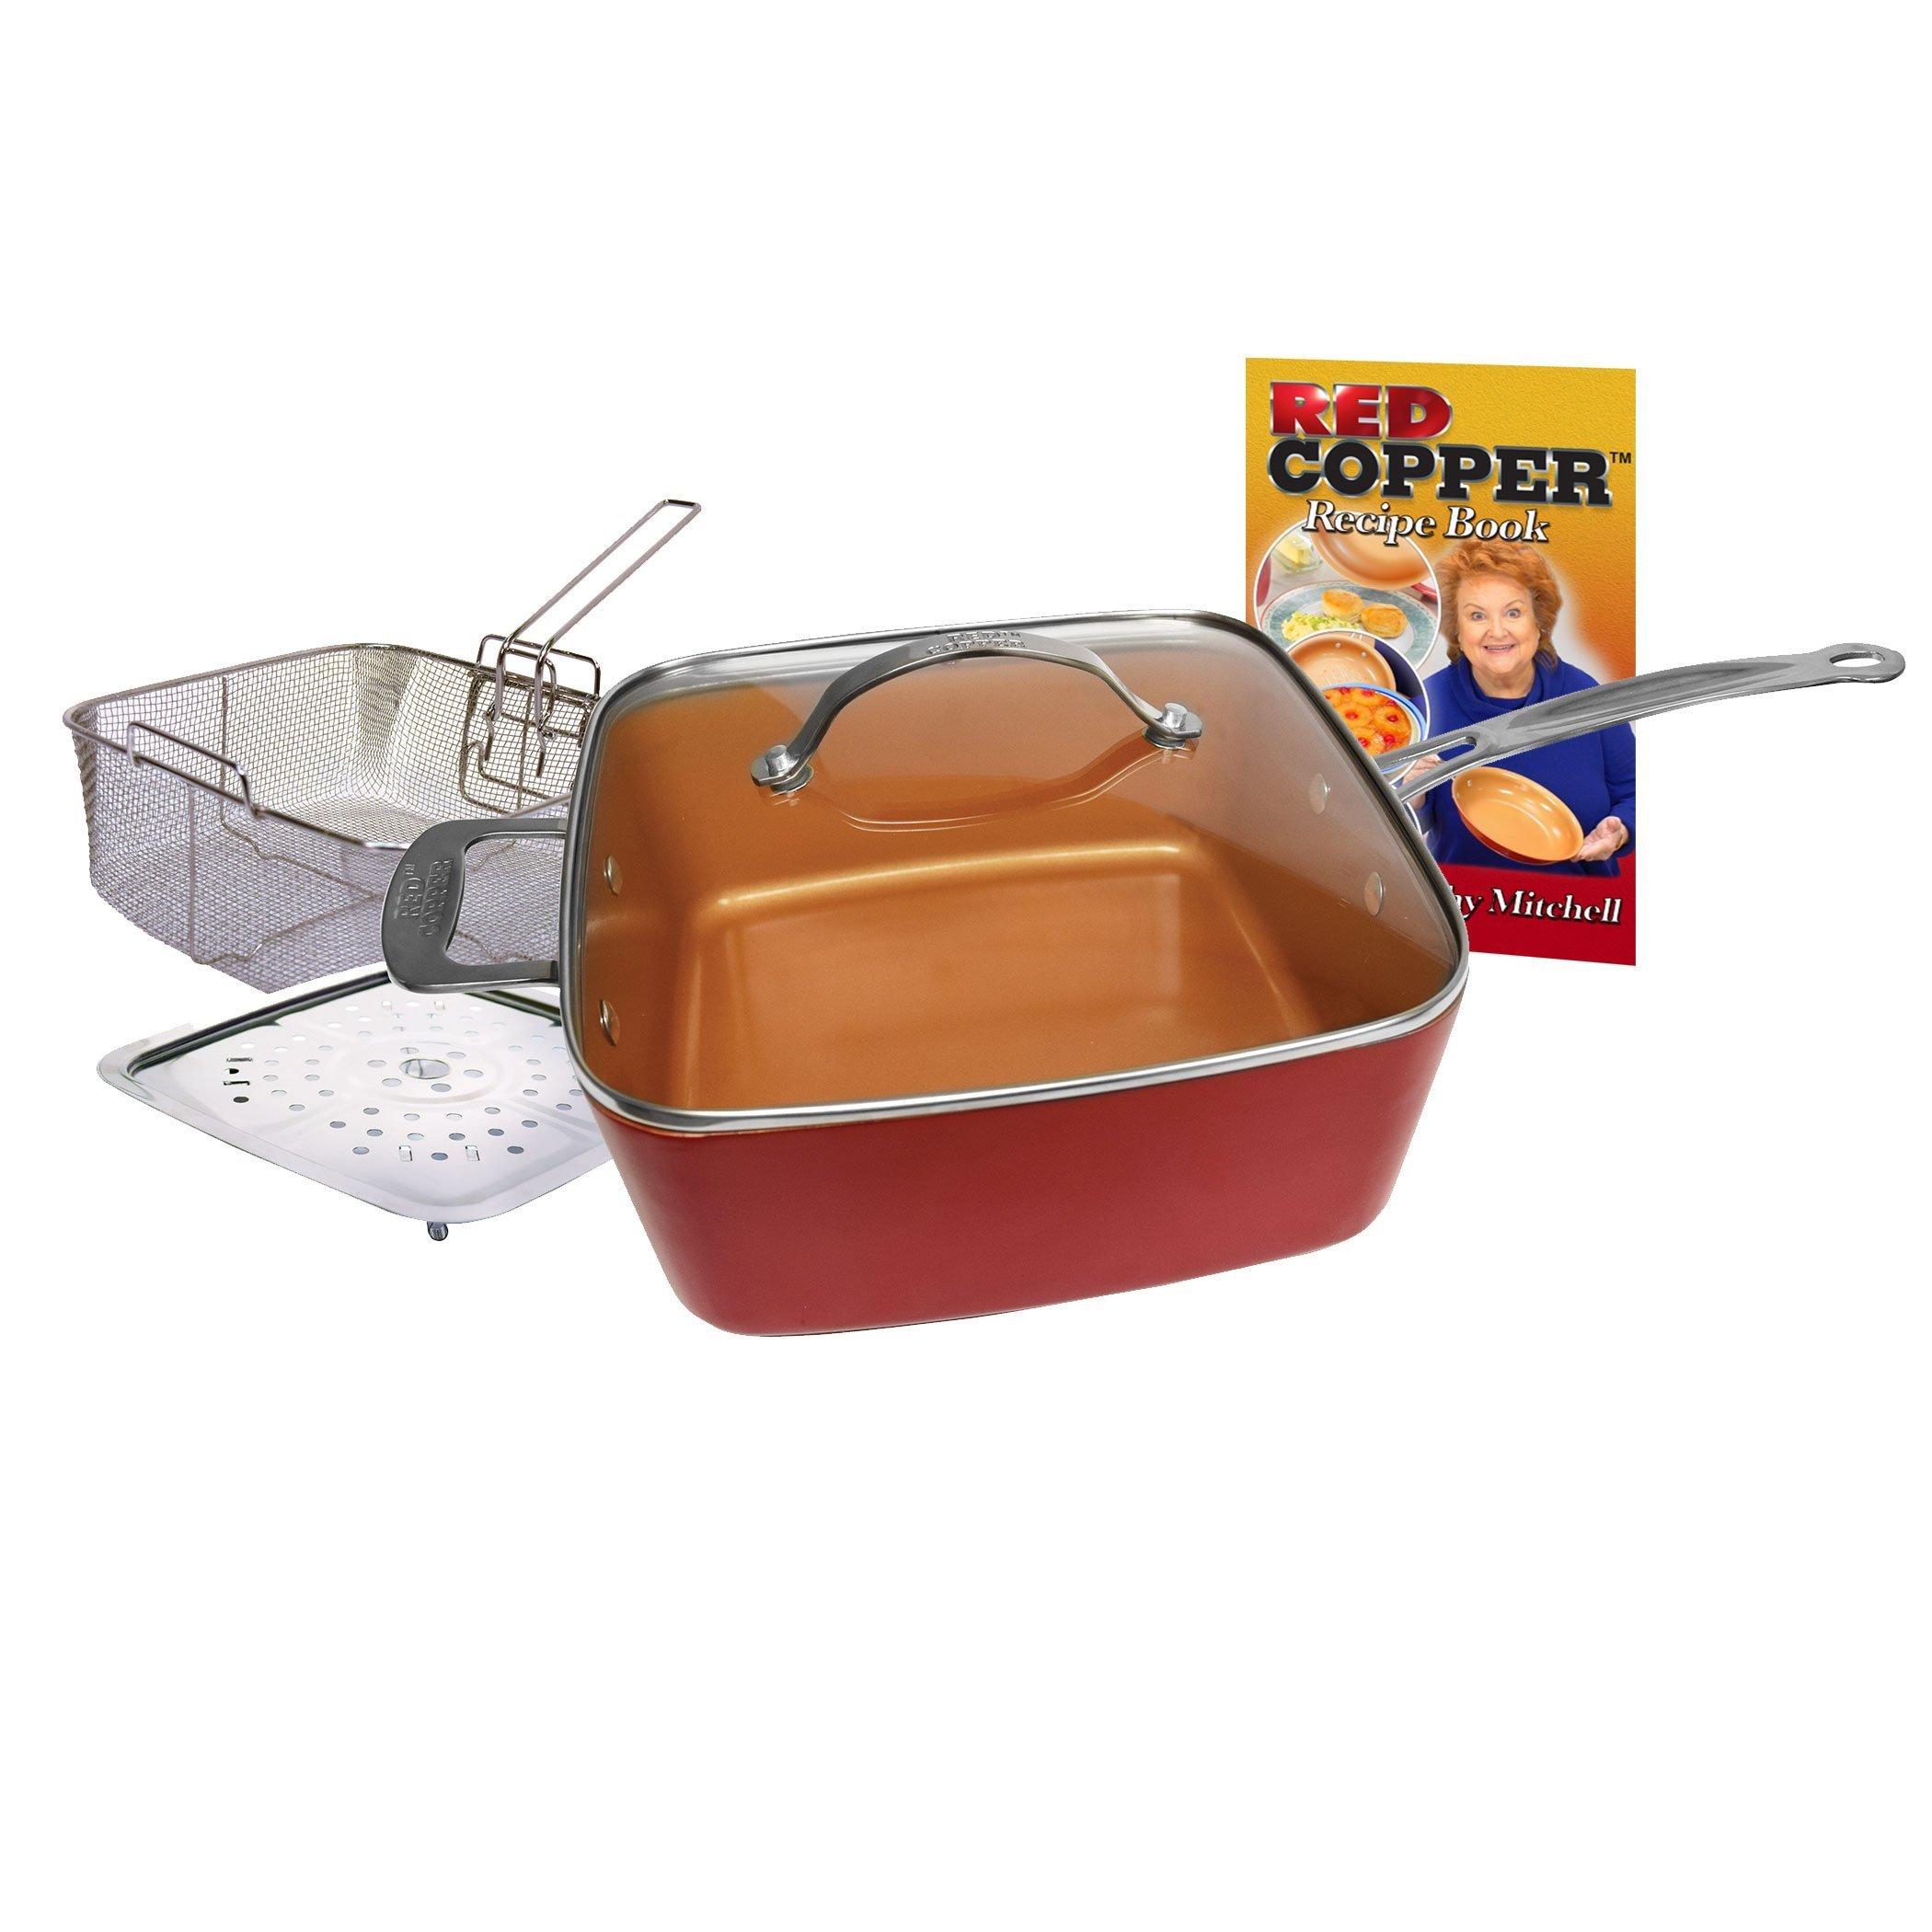 Red Copper Ceramic Cookware 0097298028045